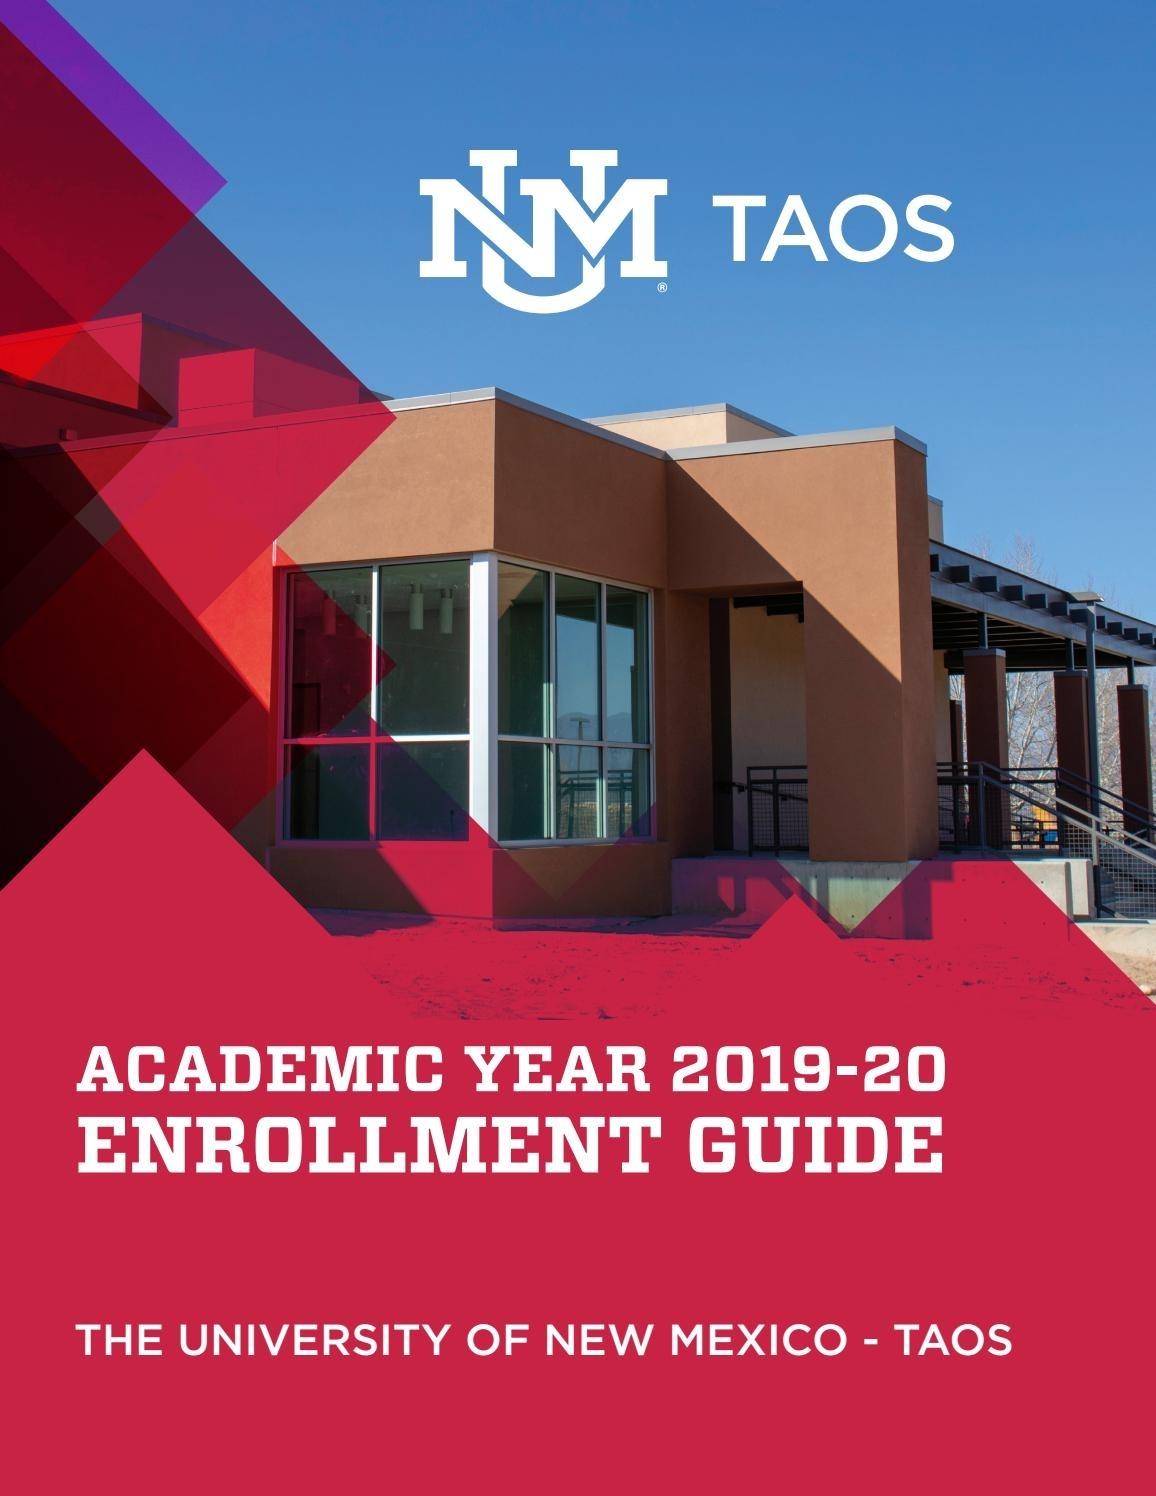 Unm-Taos Enrollment Guide: Academic Year 2019-20Unm Taos